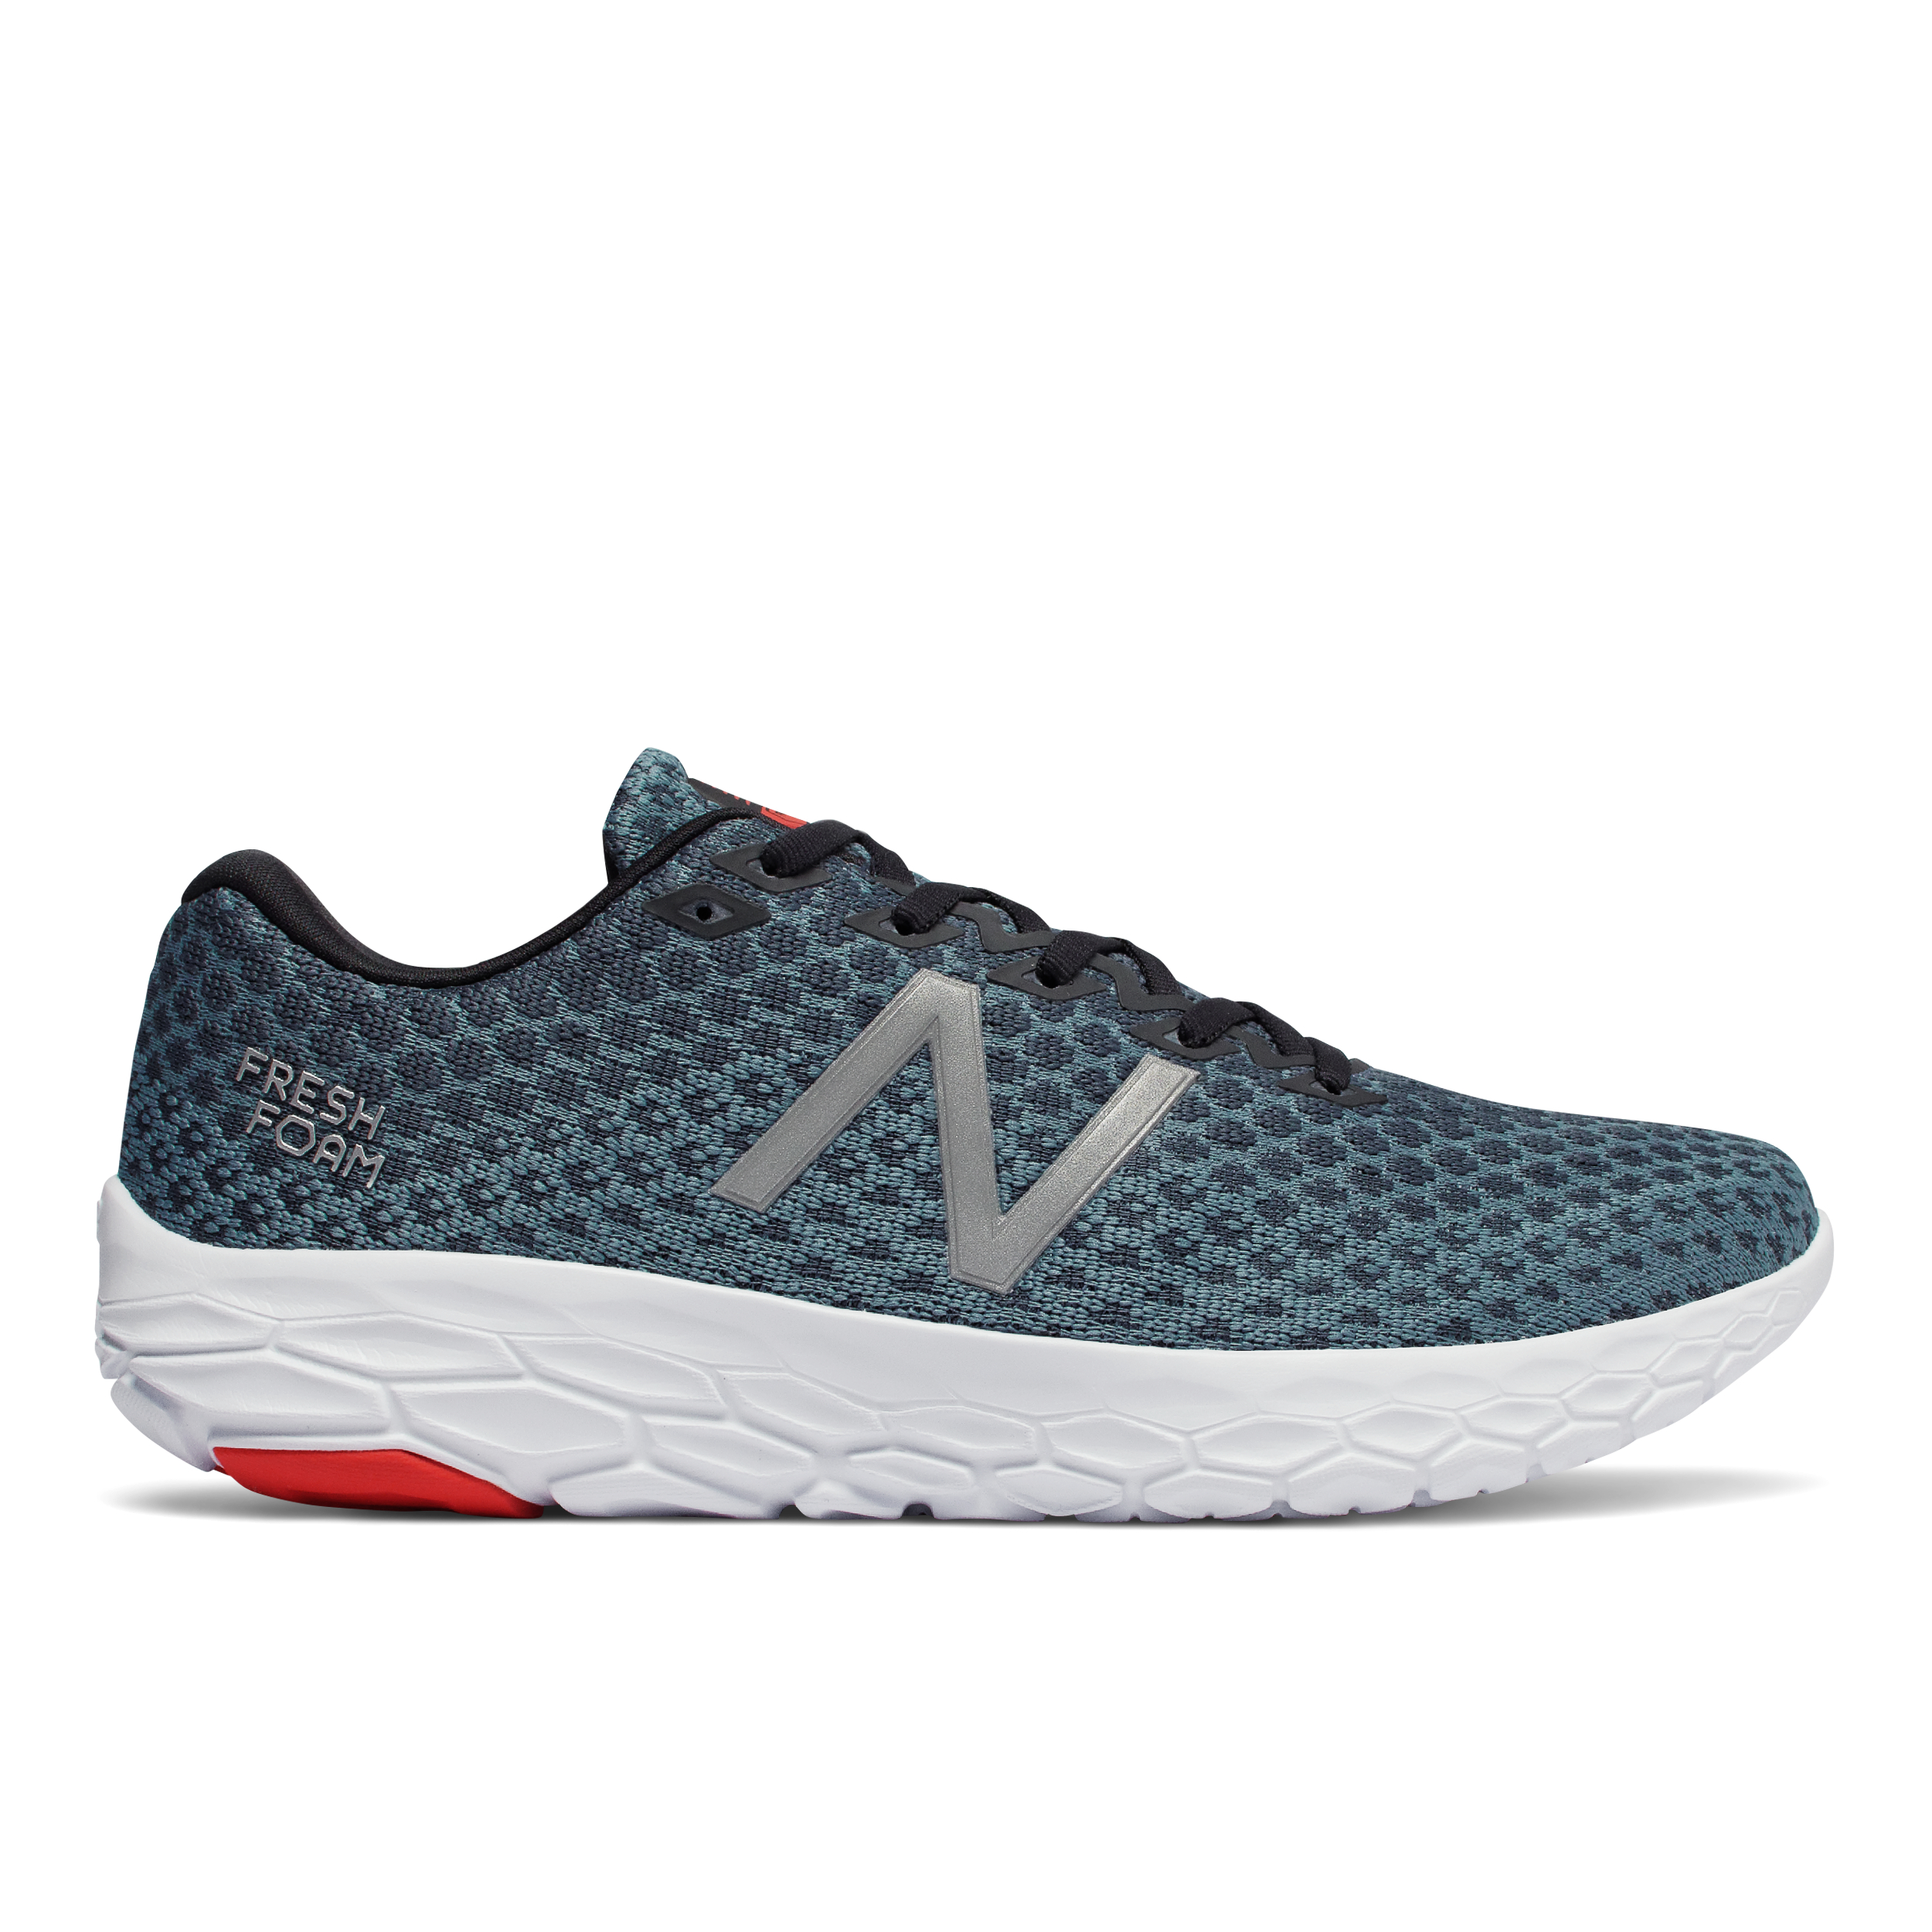 New Balance MBECNPF Beacon V1 Fresh Foam Dark Grey Running shoes